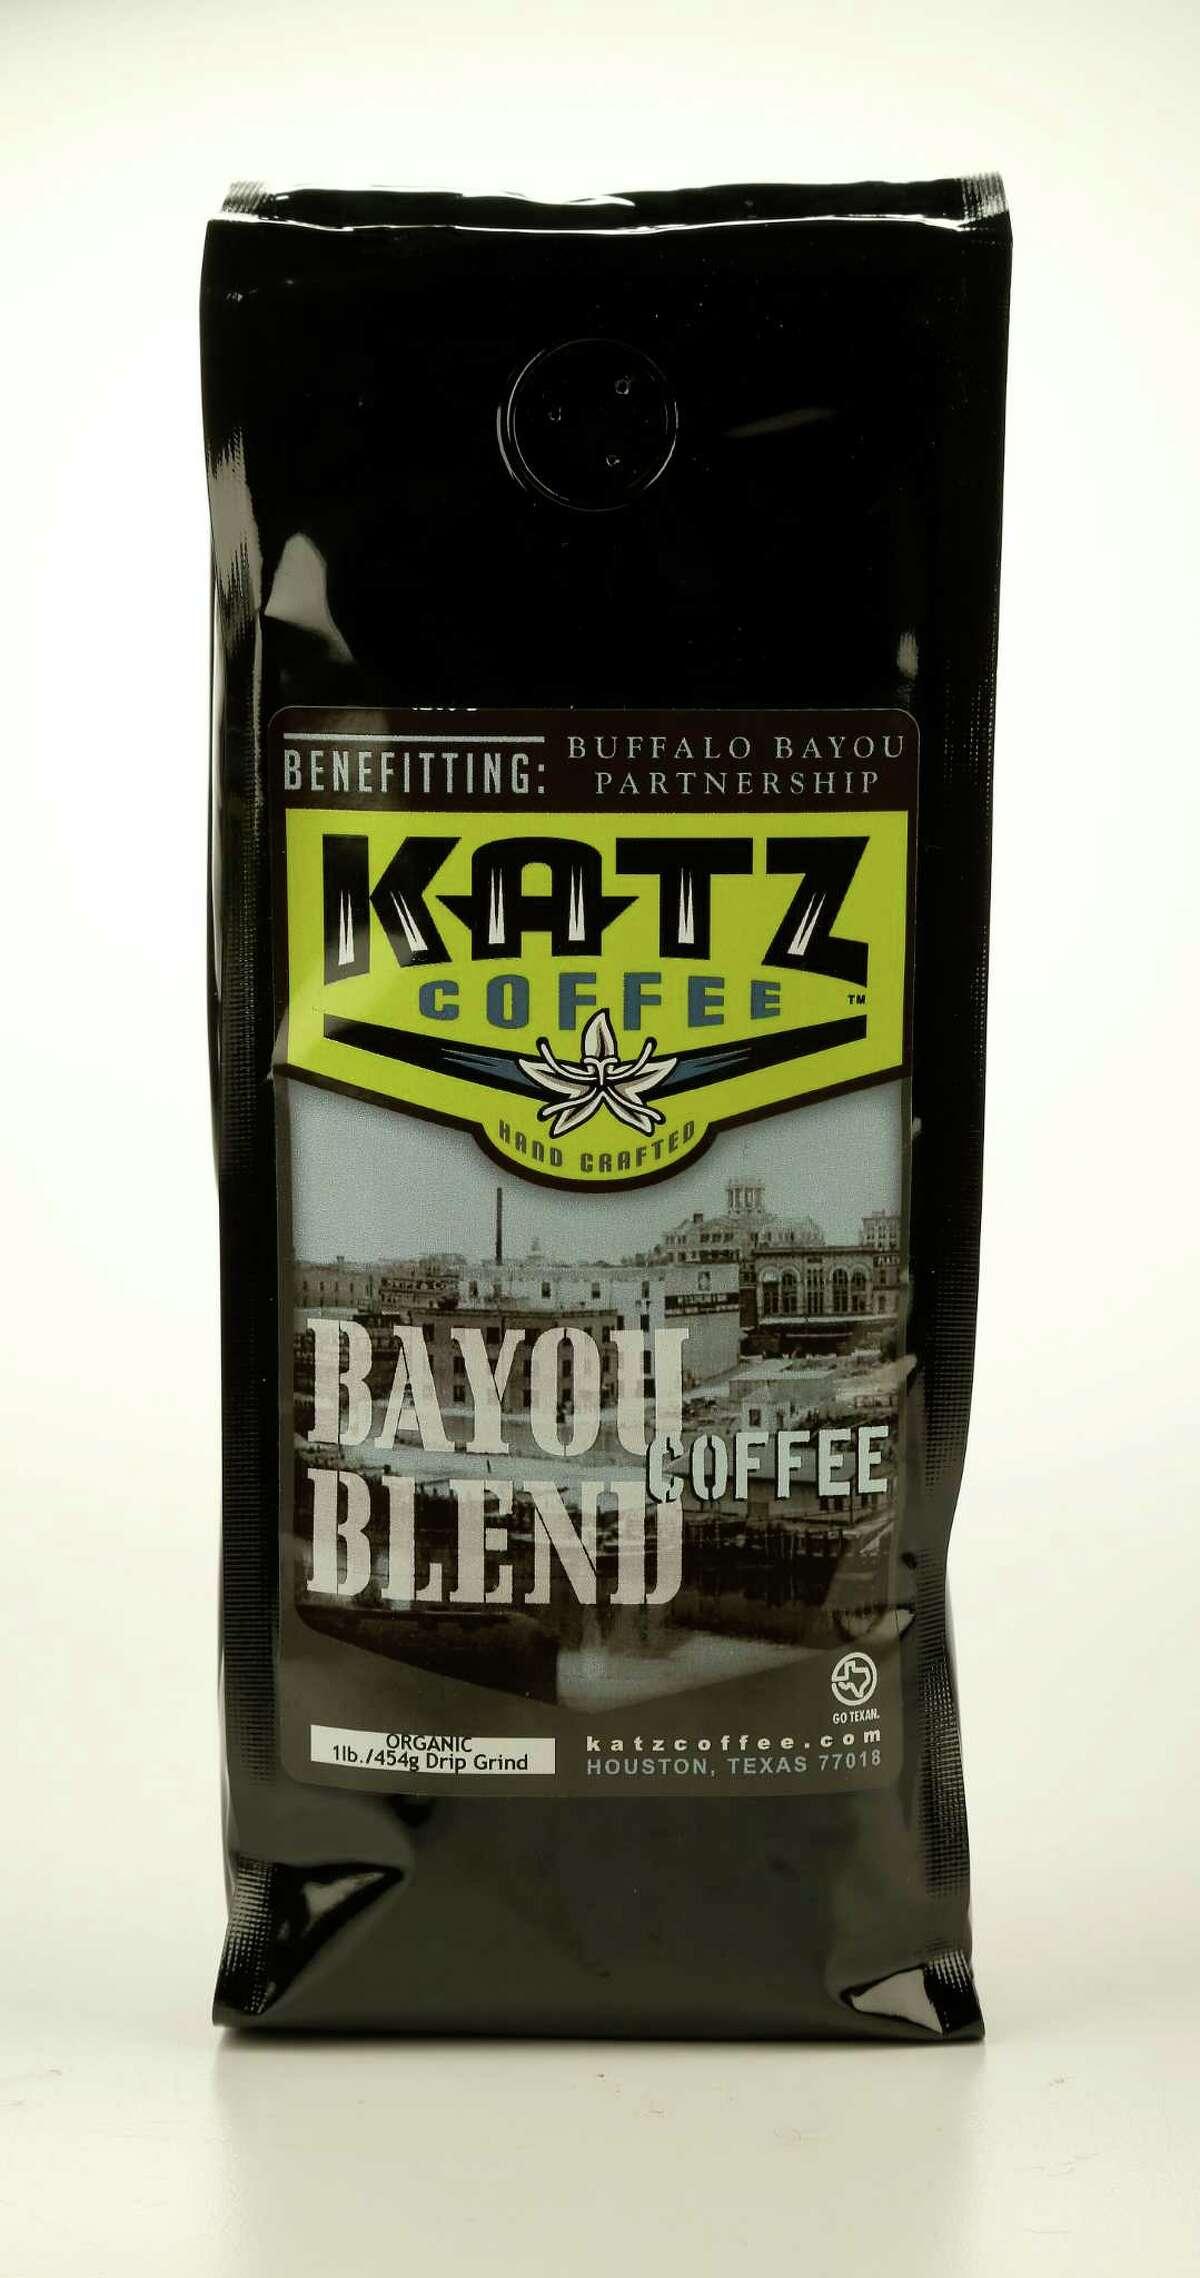 Katz Coffee Bayou Blend, benefiting Buffalo Bayou Partnership. Photographed in the Houston Chronicle studio, Thursday, Nov. 21, 2013, in Houston. ( Karen Warren / Houston Chronicle )